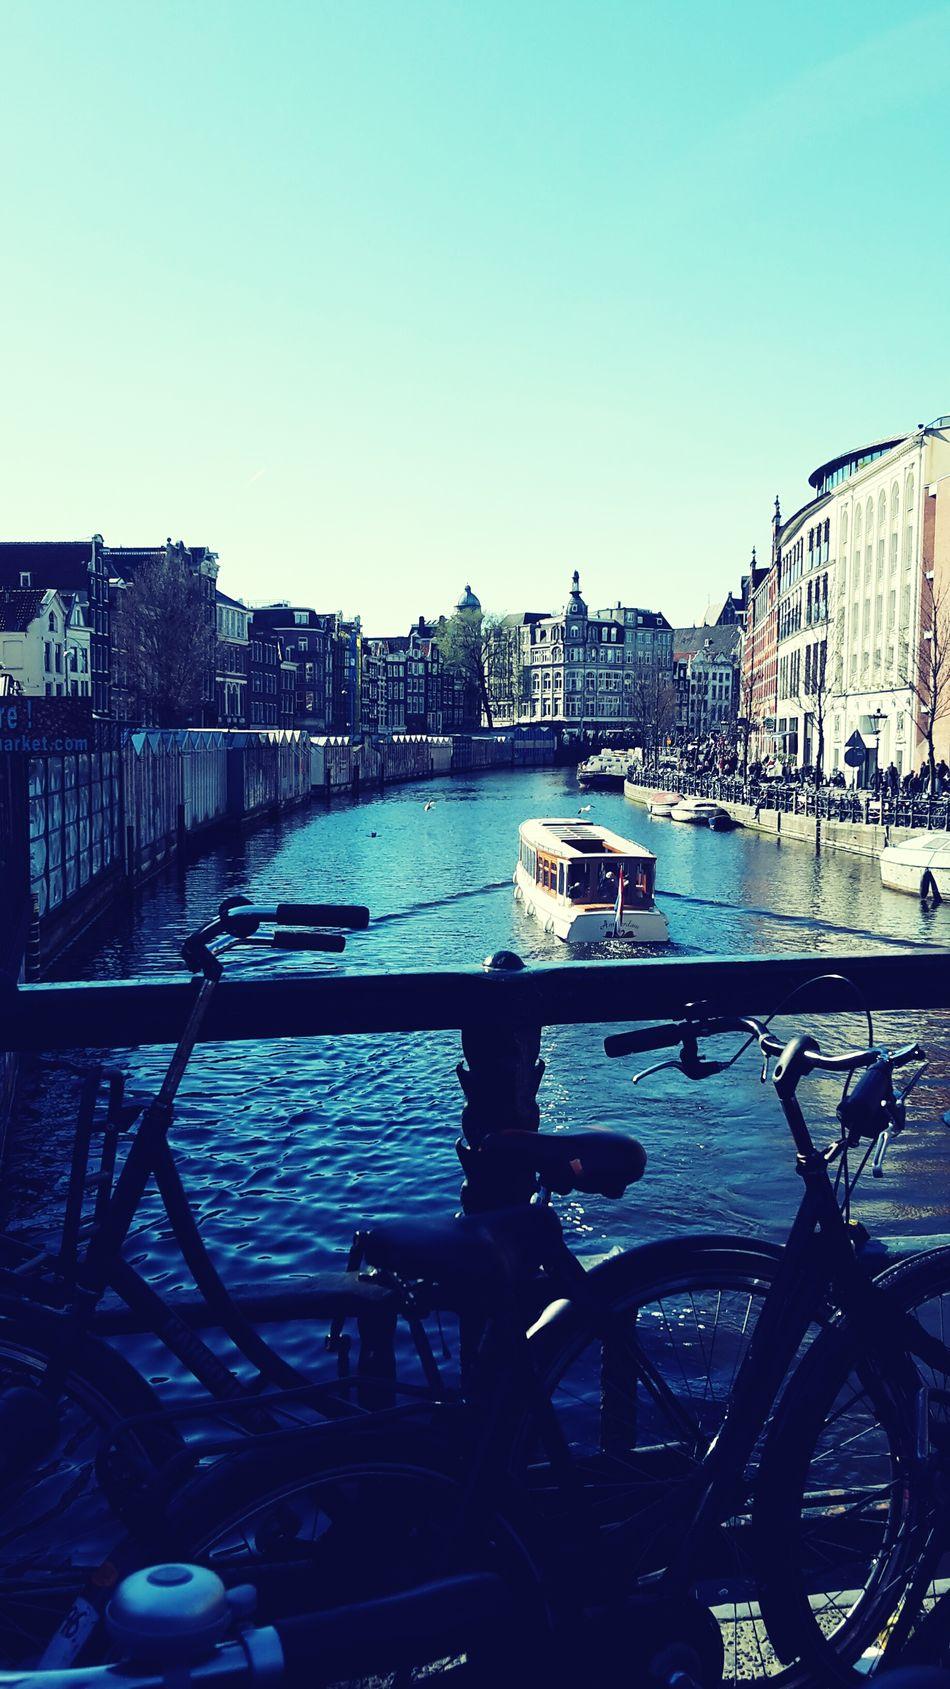 Amsterdam Canal Amsterdam Netherlands Holand Marketflowers Amsterdam.nl